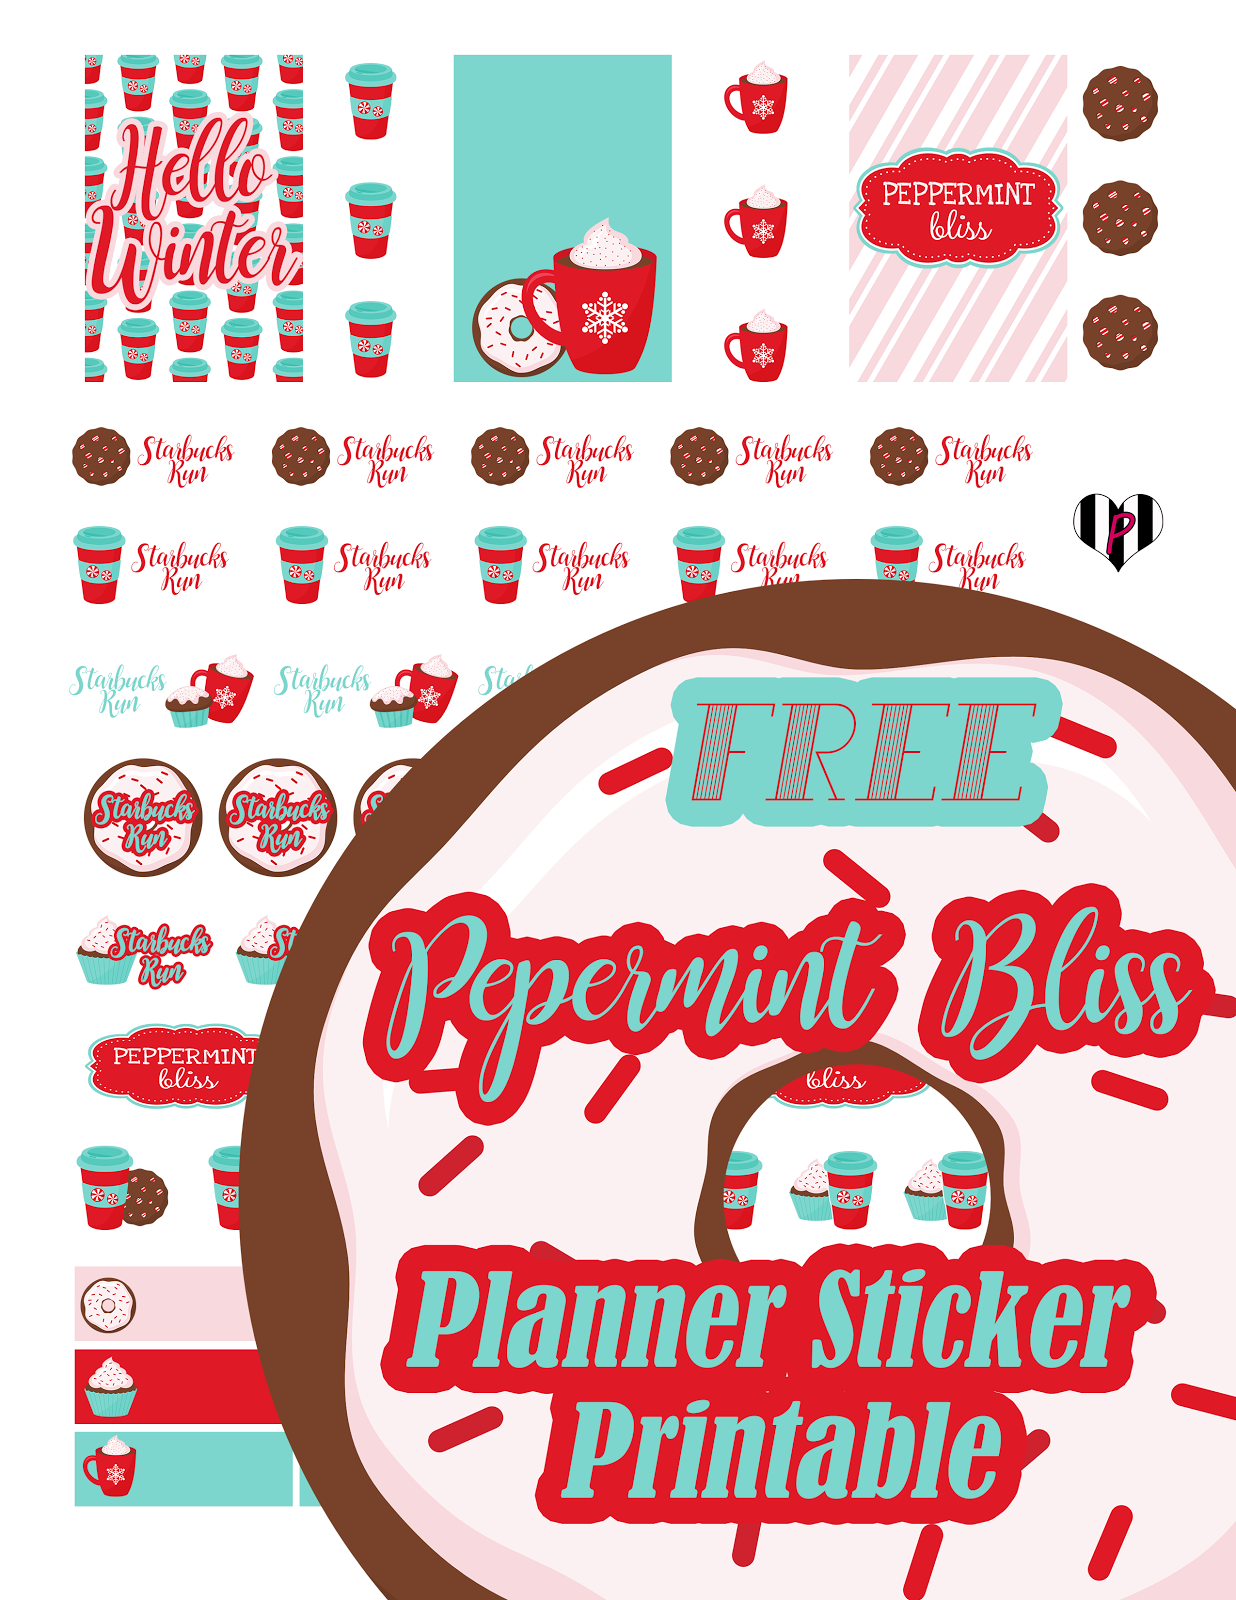 Pin de aurora mussino en Planning | Pinterest | Imprimibles, Navidad ...